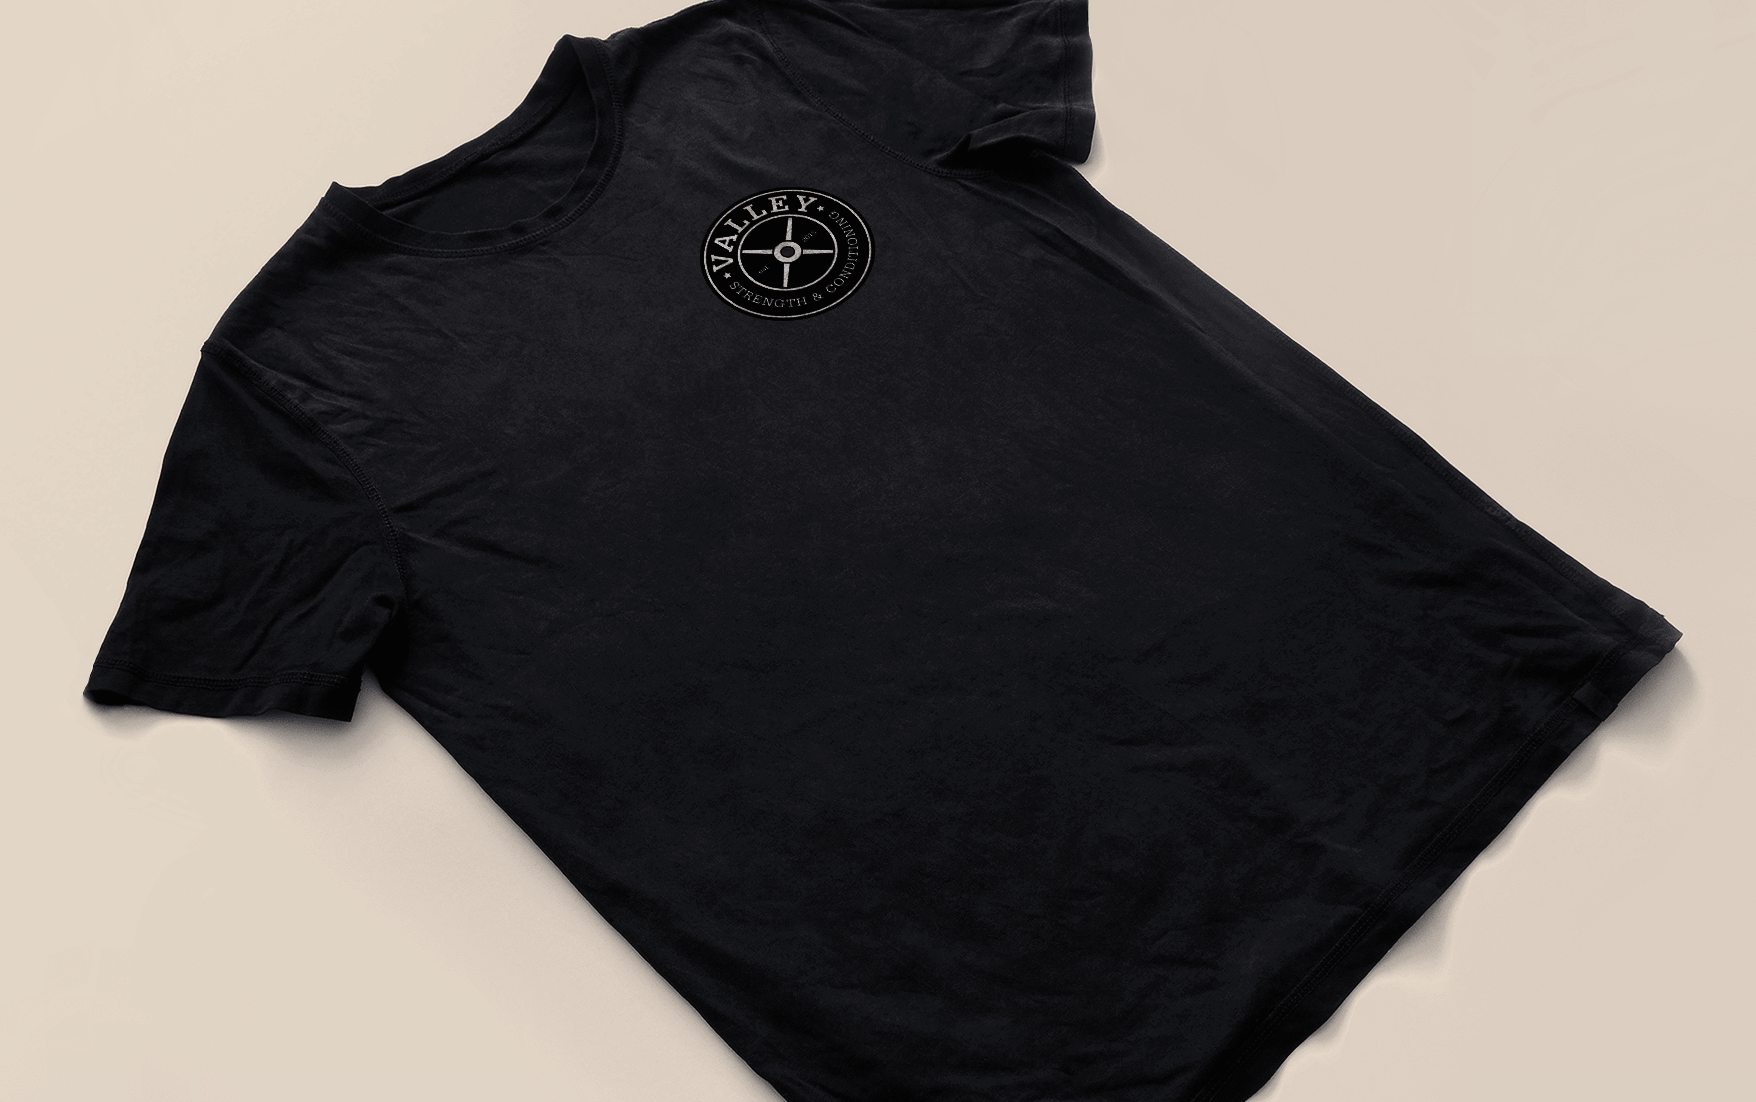 t-shirt-min.png